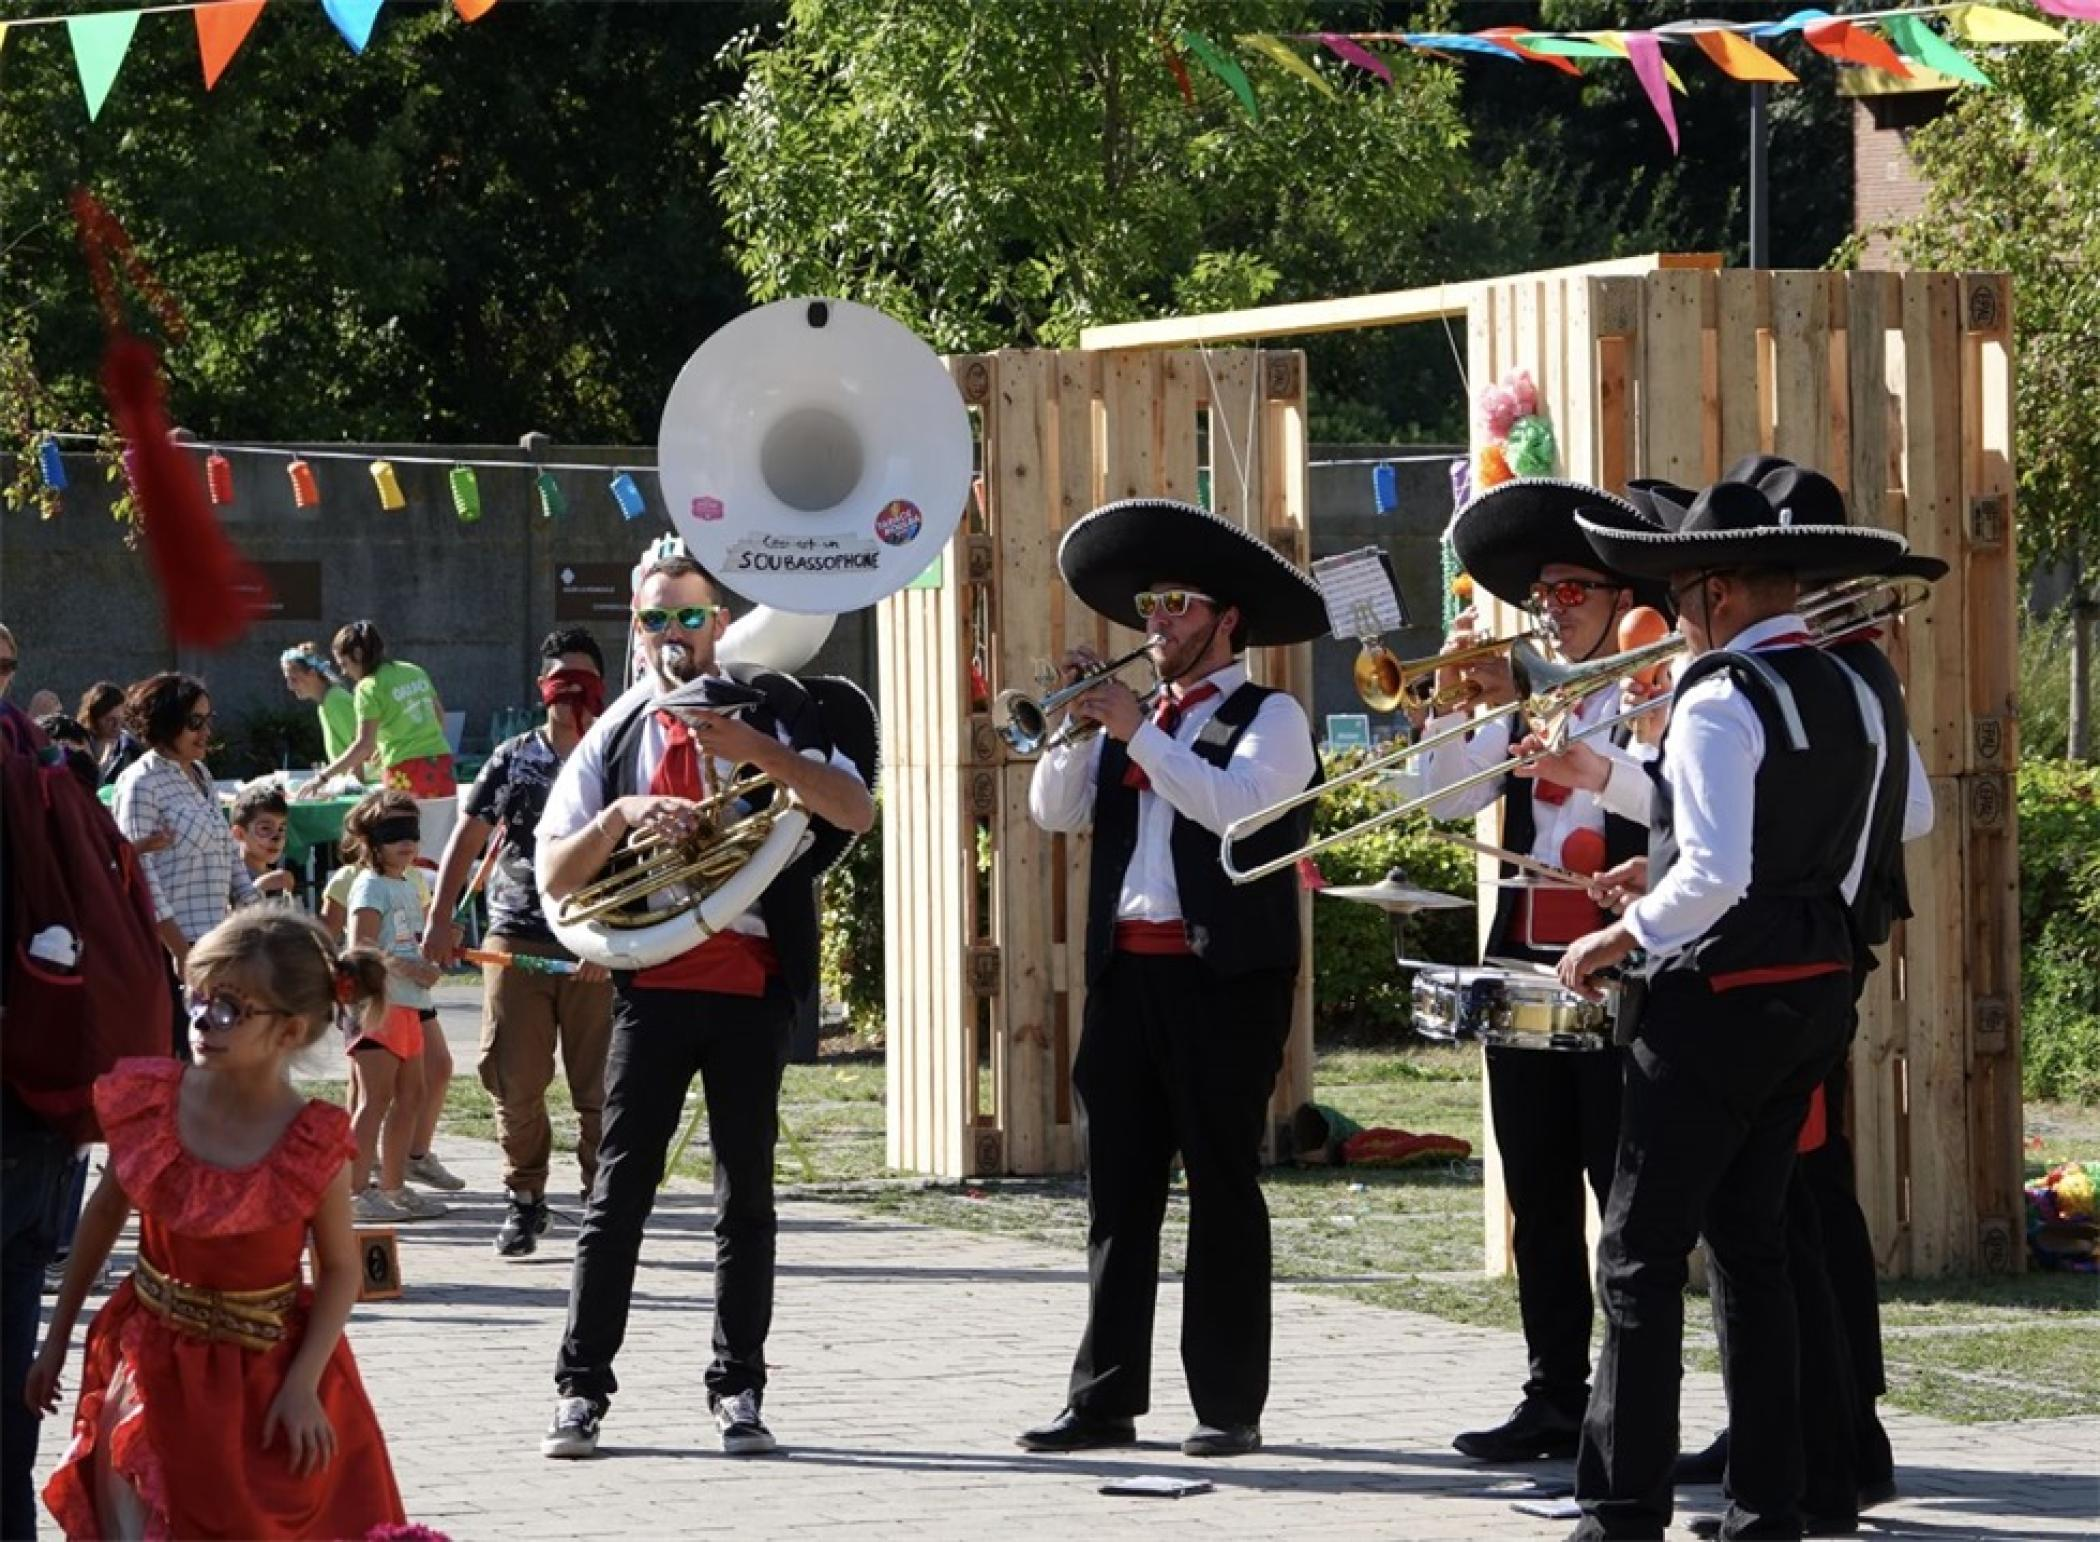 AG2R La Mondiale儿童节家庭日活动策划满是墨西哥文化氛围